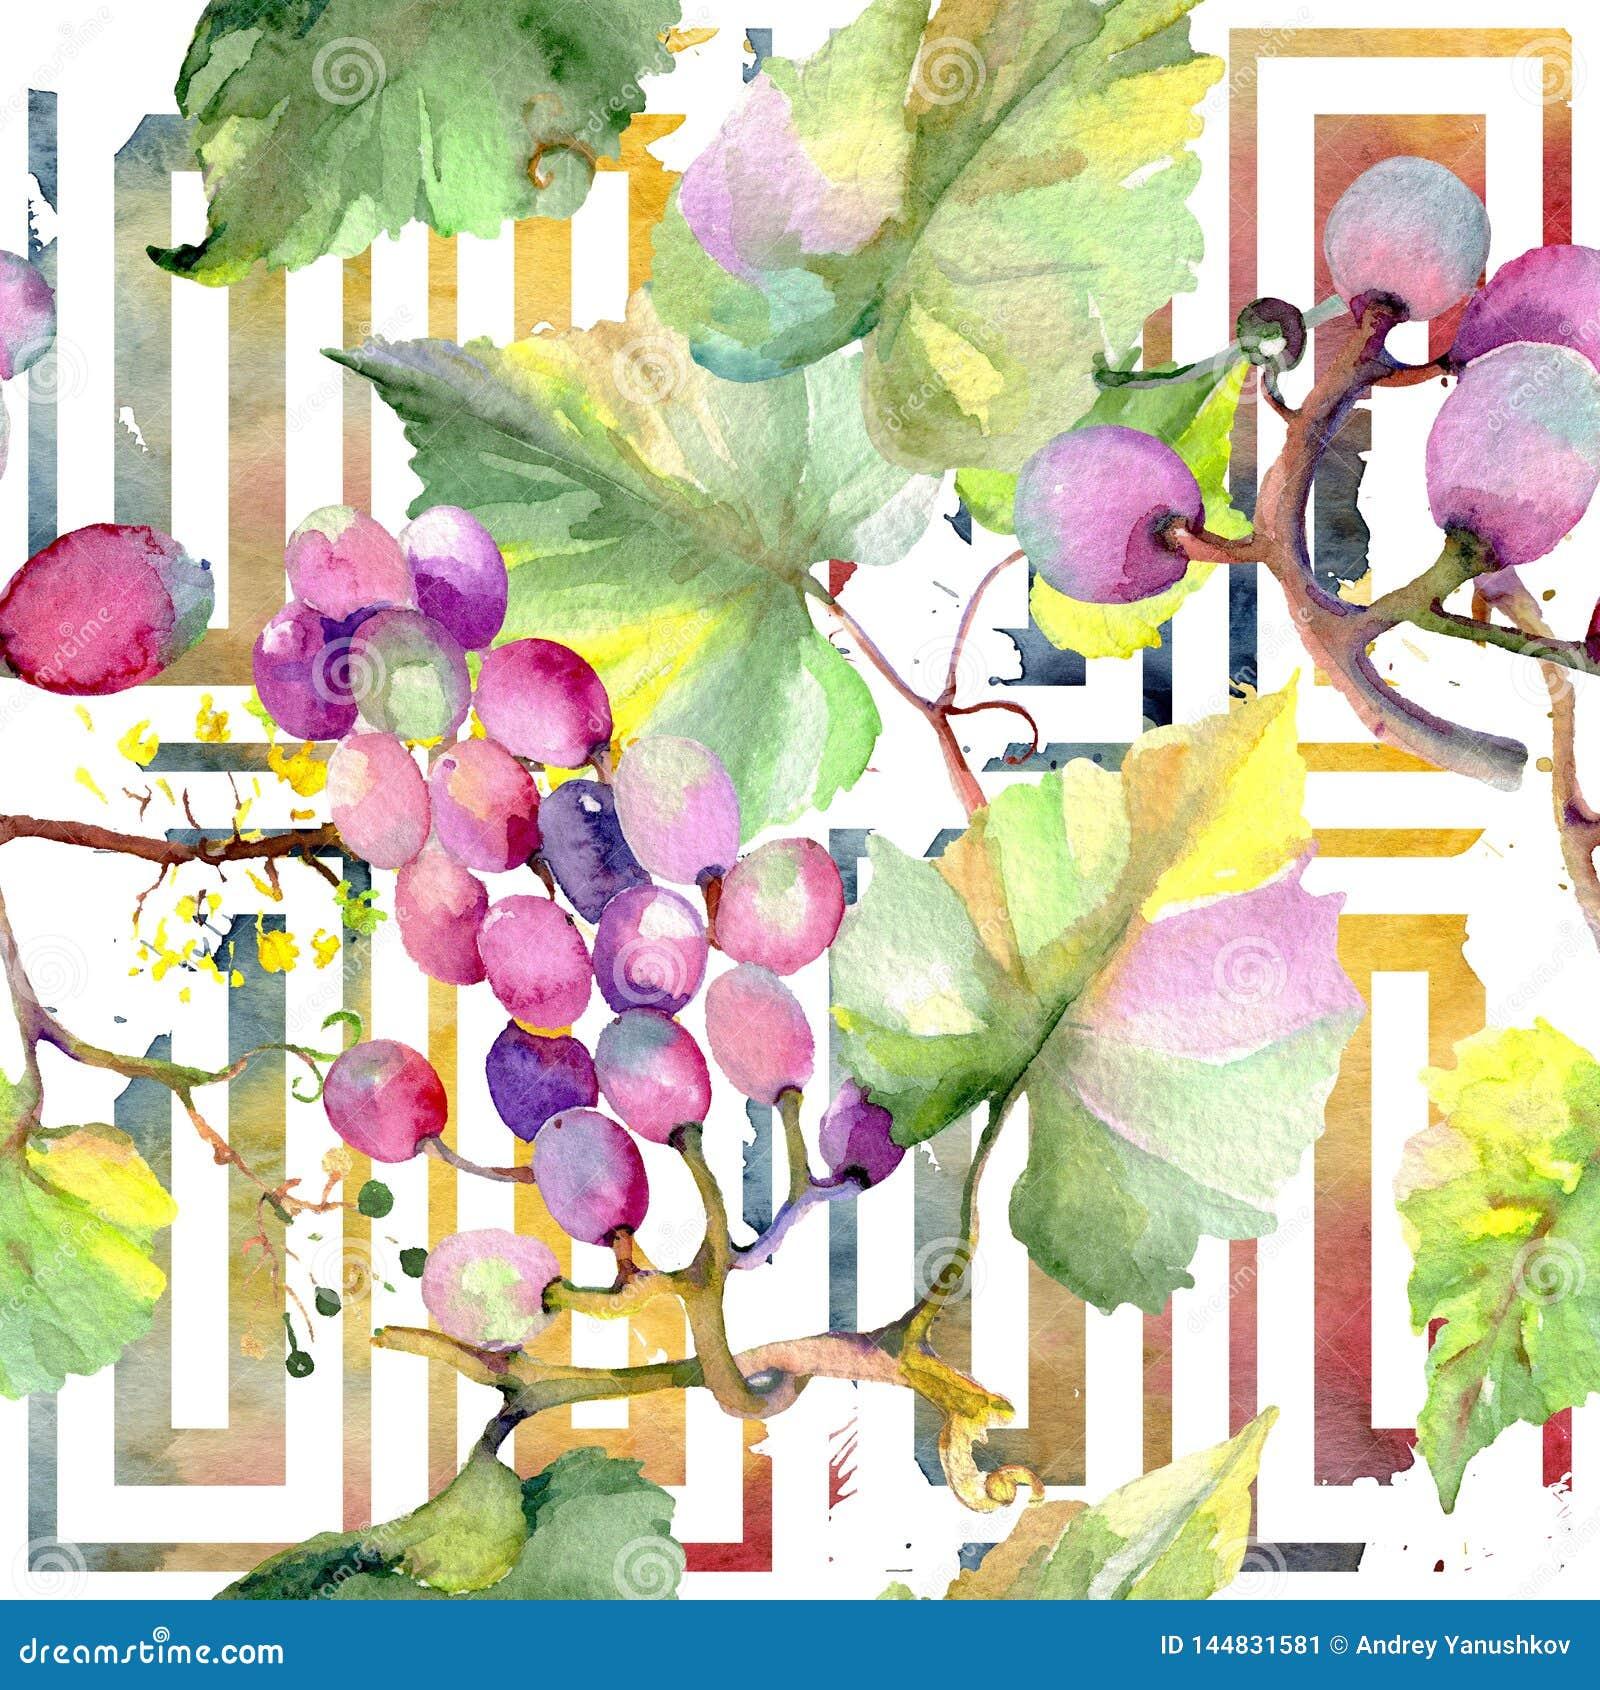 Grape Berry Healthy Food Watercolor Illustration Set